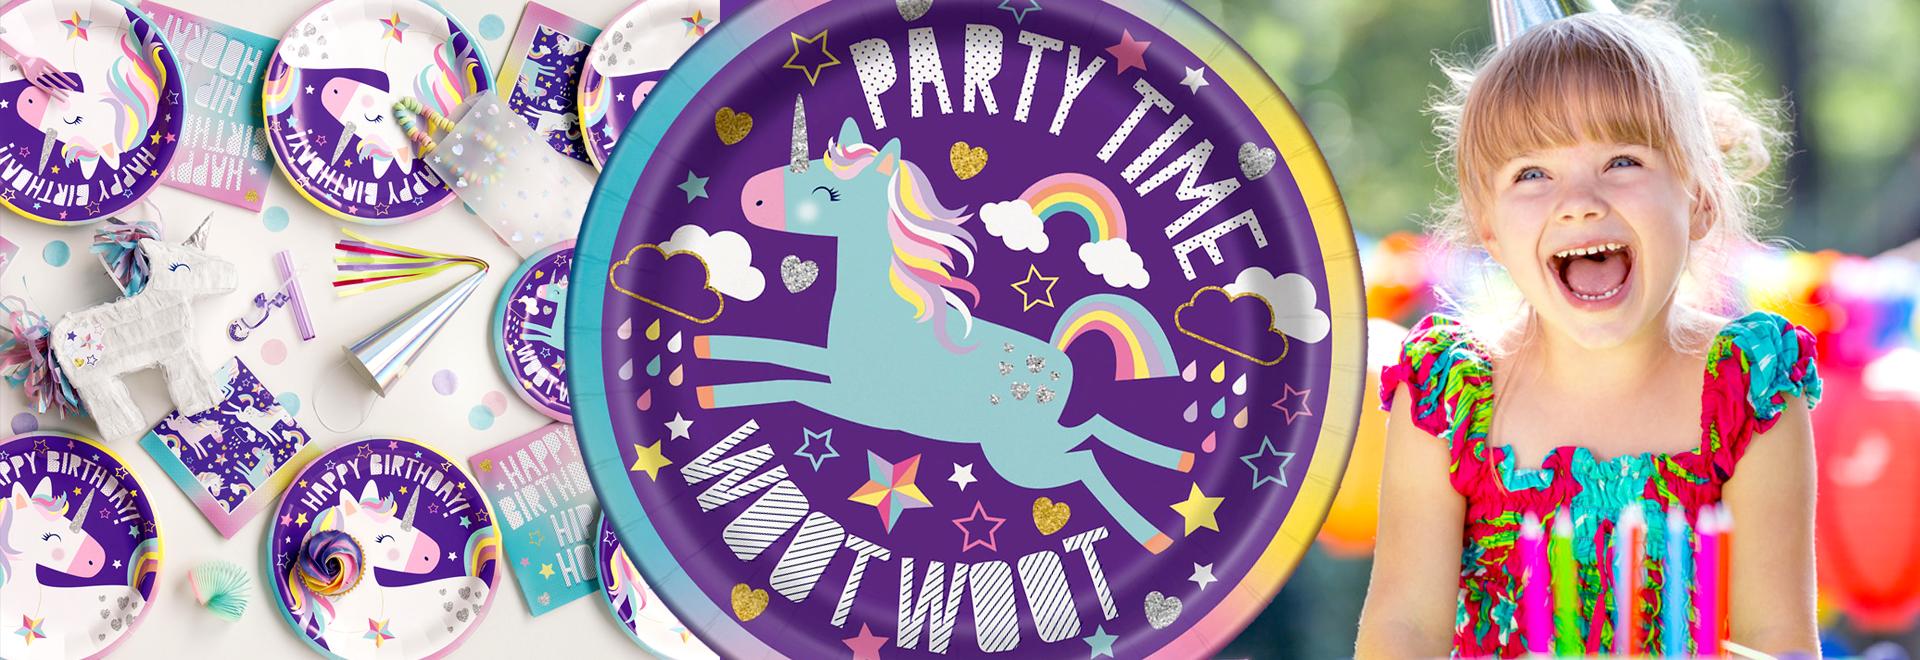 Organisez un anniversaire 100% licorne avec la vaisselle jetable Happybirthday licorne